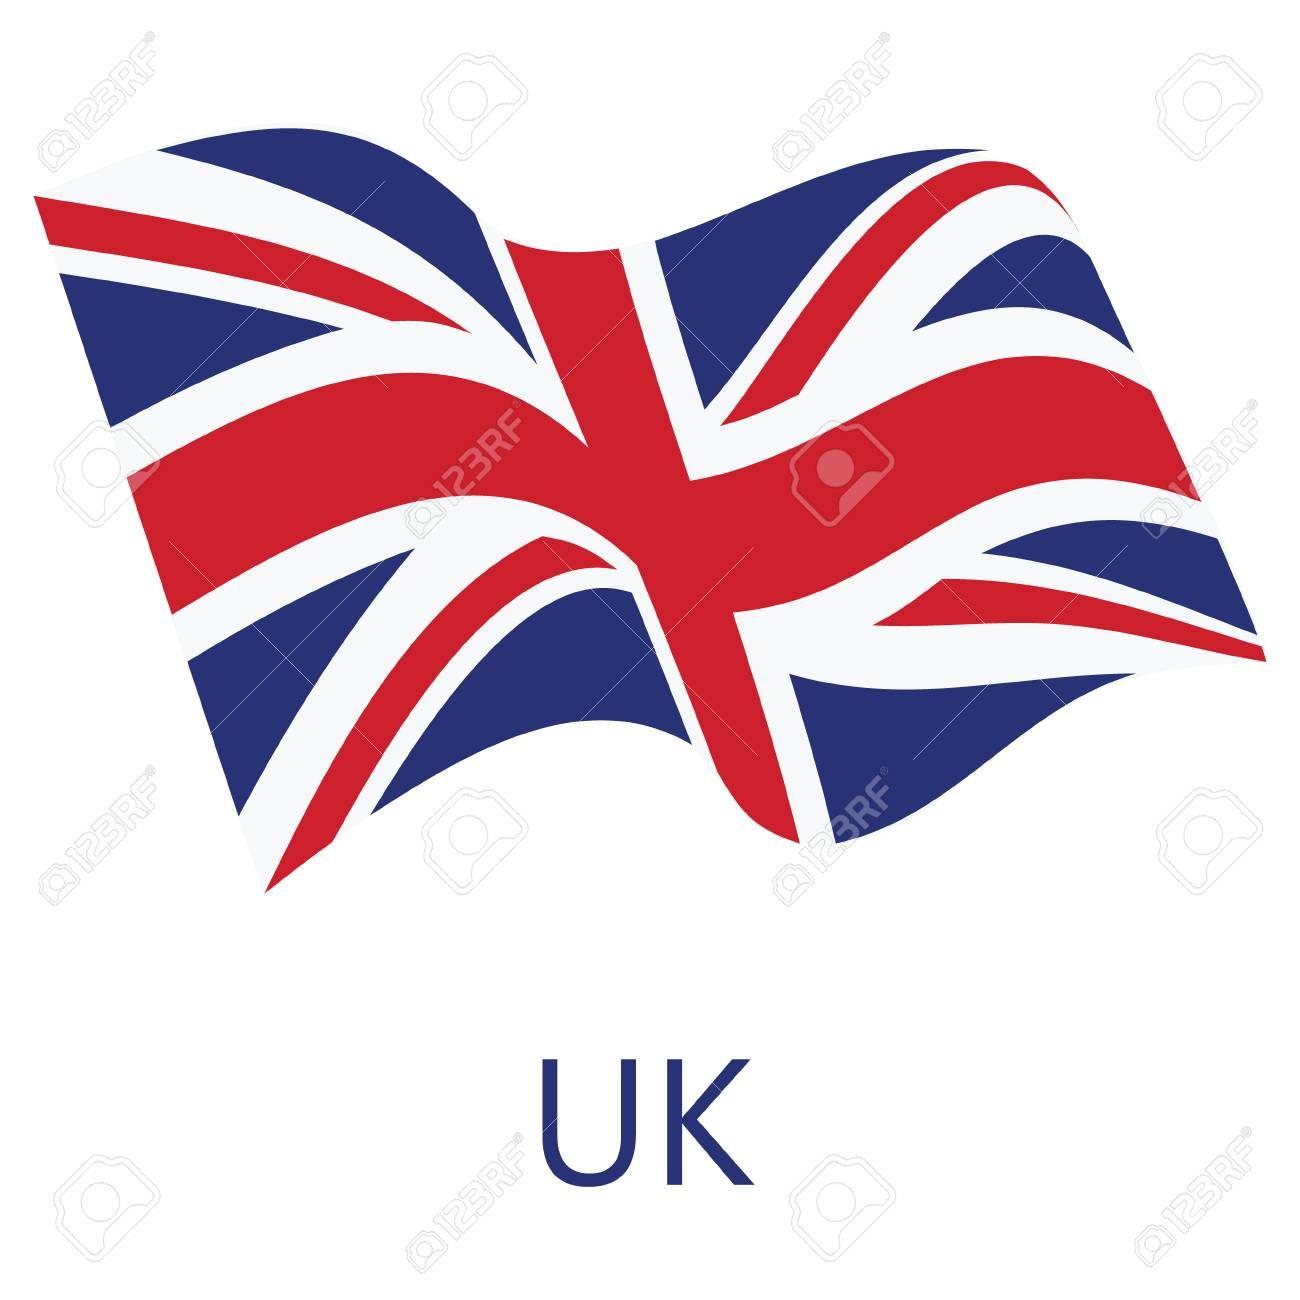 Vector Illustration Waving Flag Of United Kingdom Of Great Britain Icon Uk Flag Button Isolated On White Backg Uk Flag Vector Illustration United Kingdom Flag